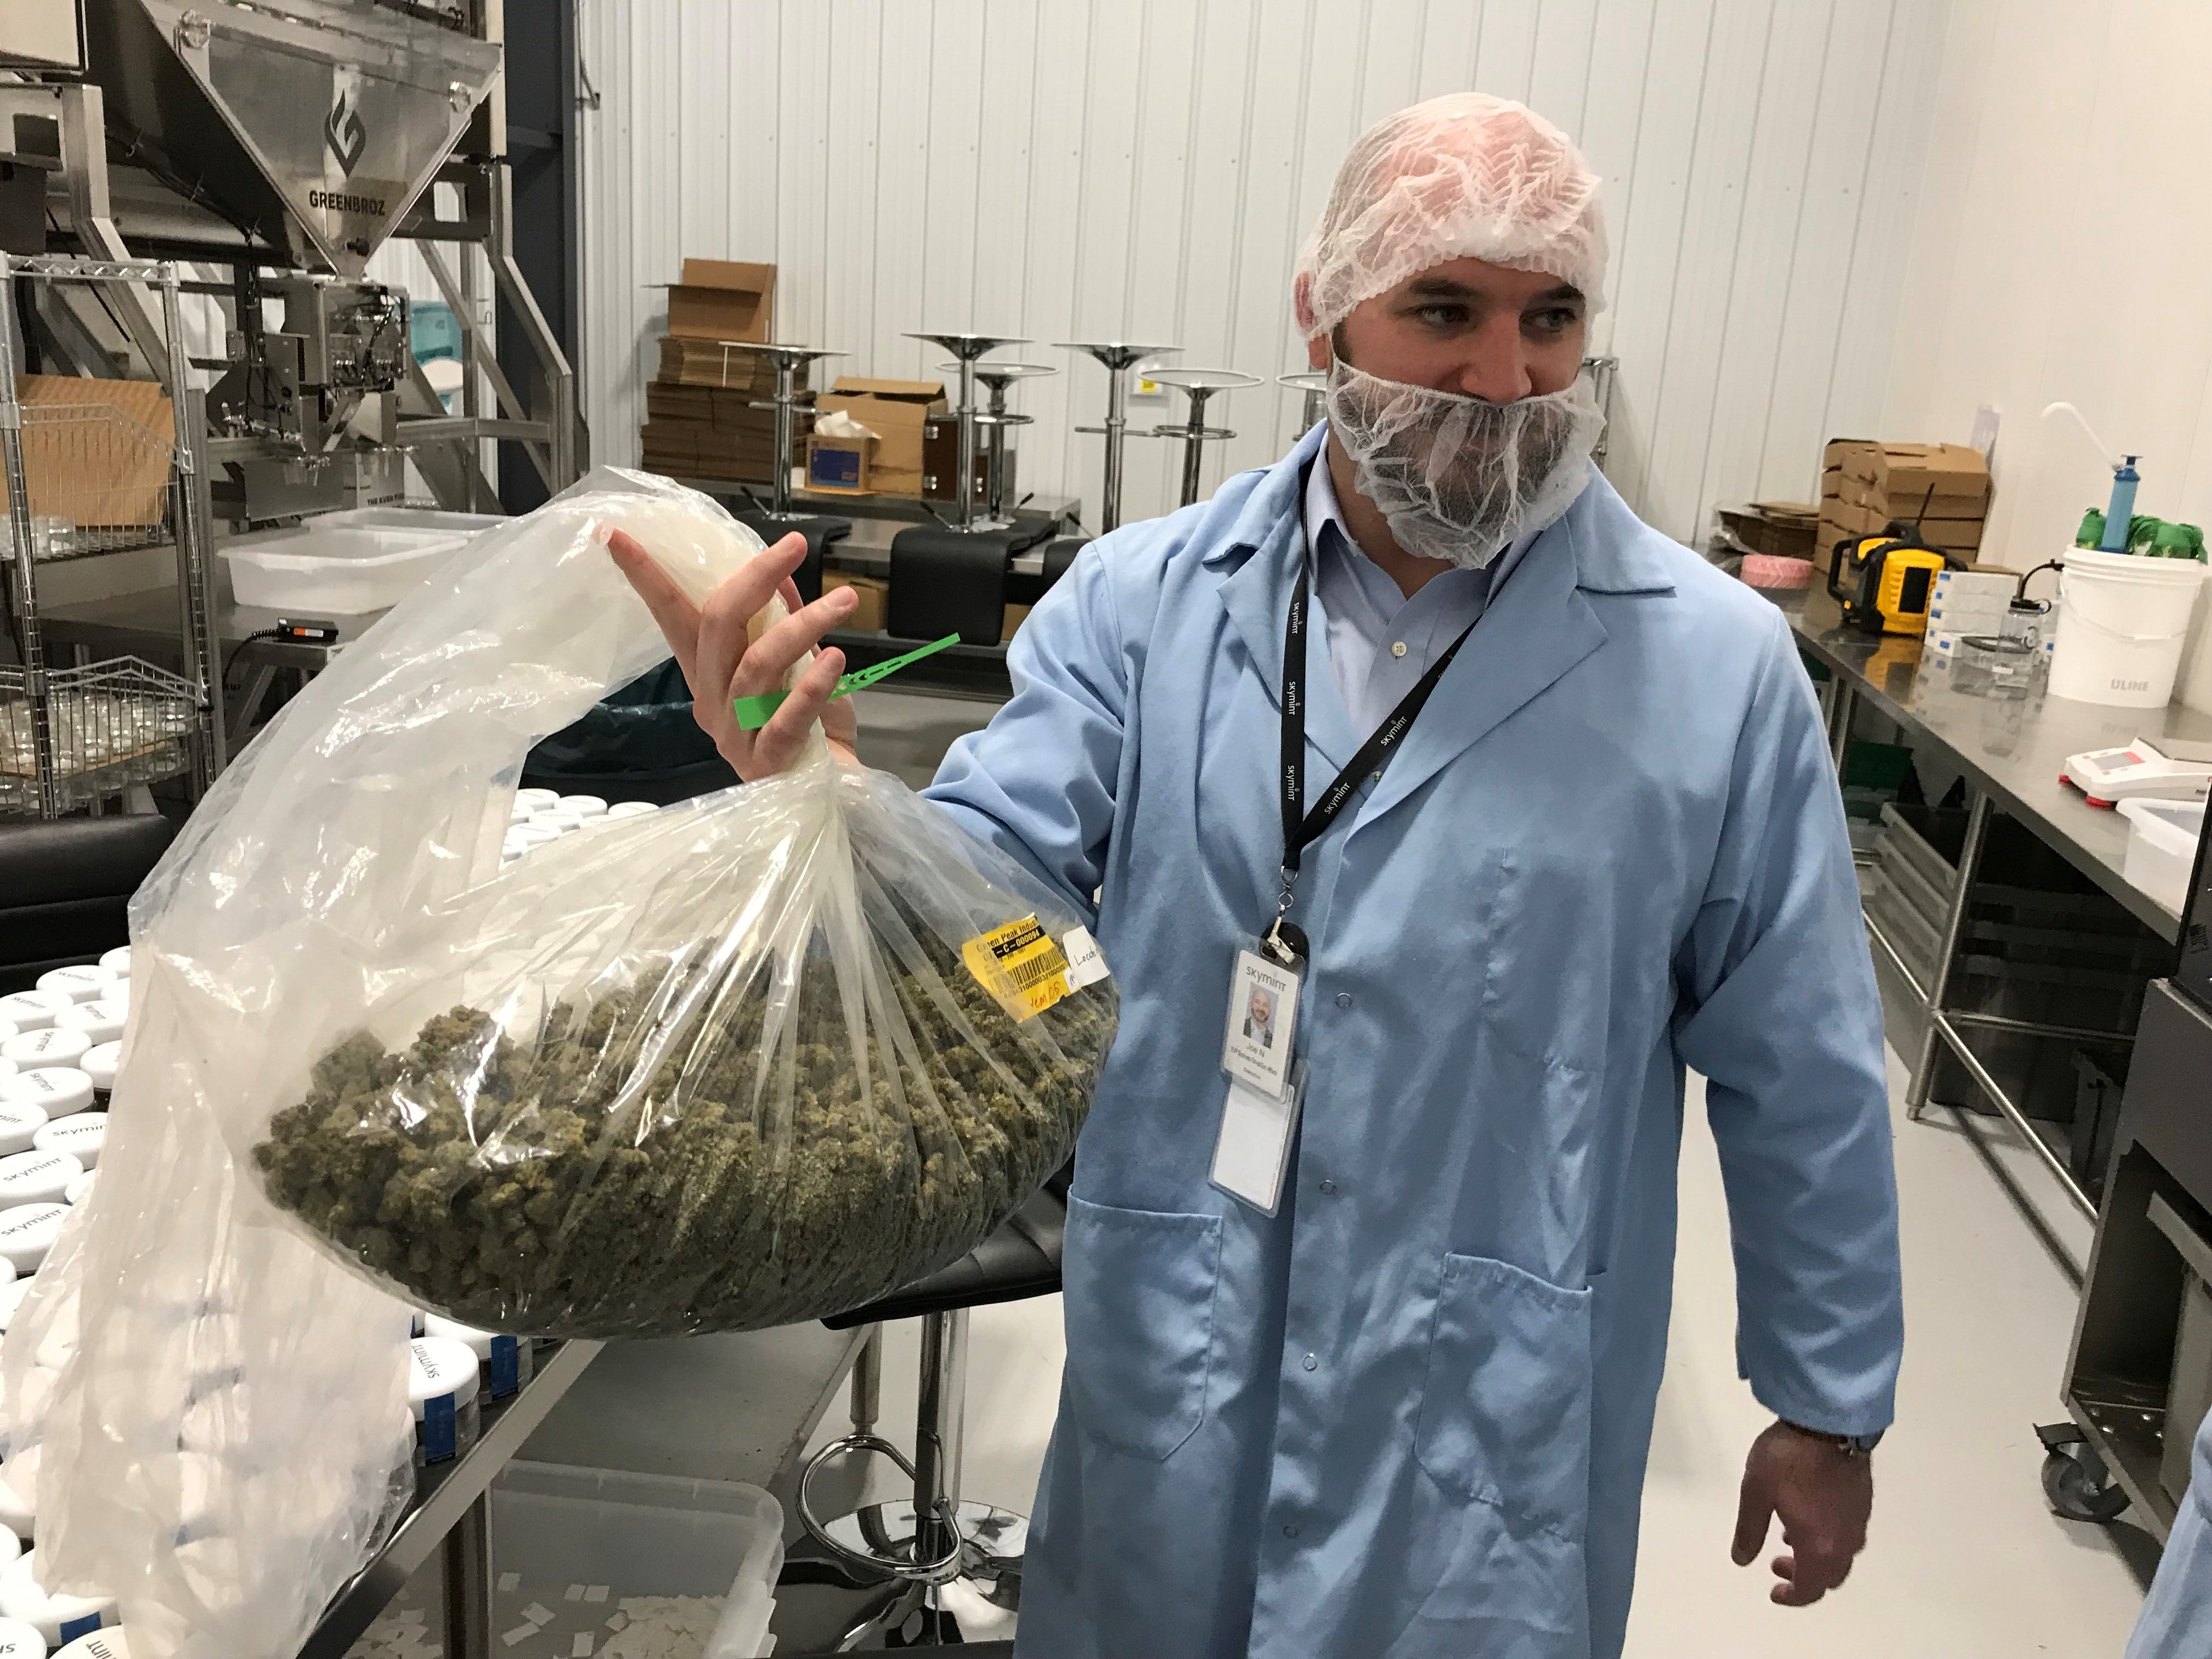 Green Peak Innovations' Joe Neller, executive vice president, shows a bag of marijuana that's grown at its Windsor Township, Michigan facility.